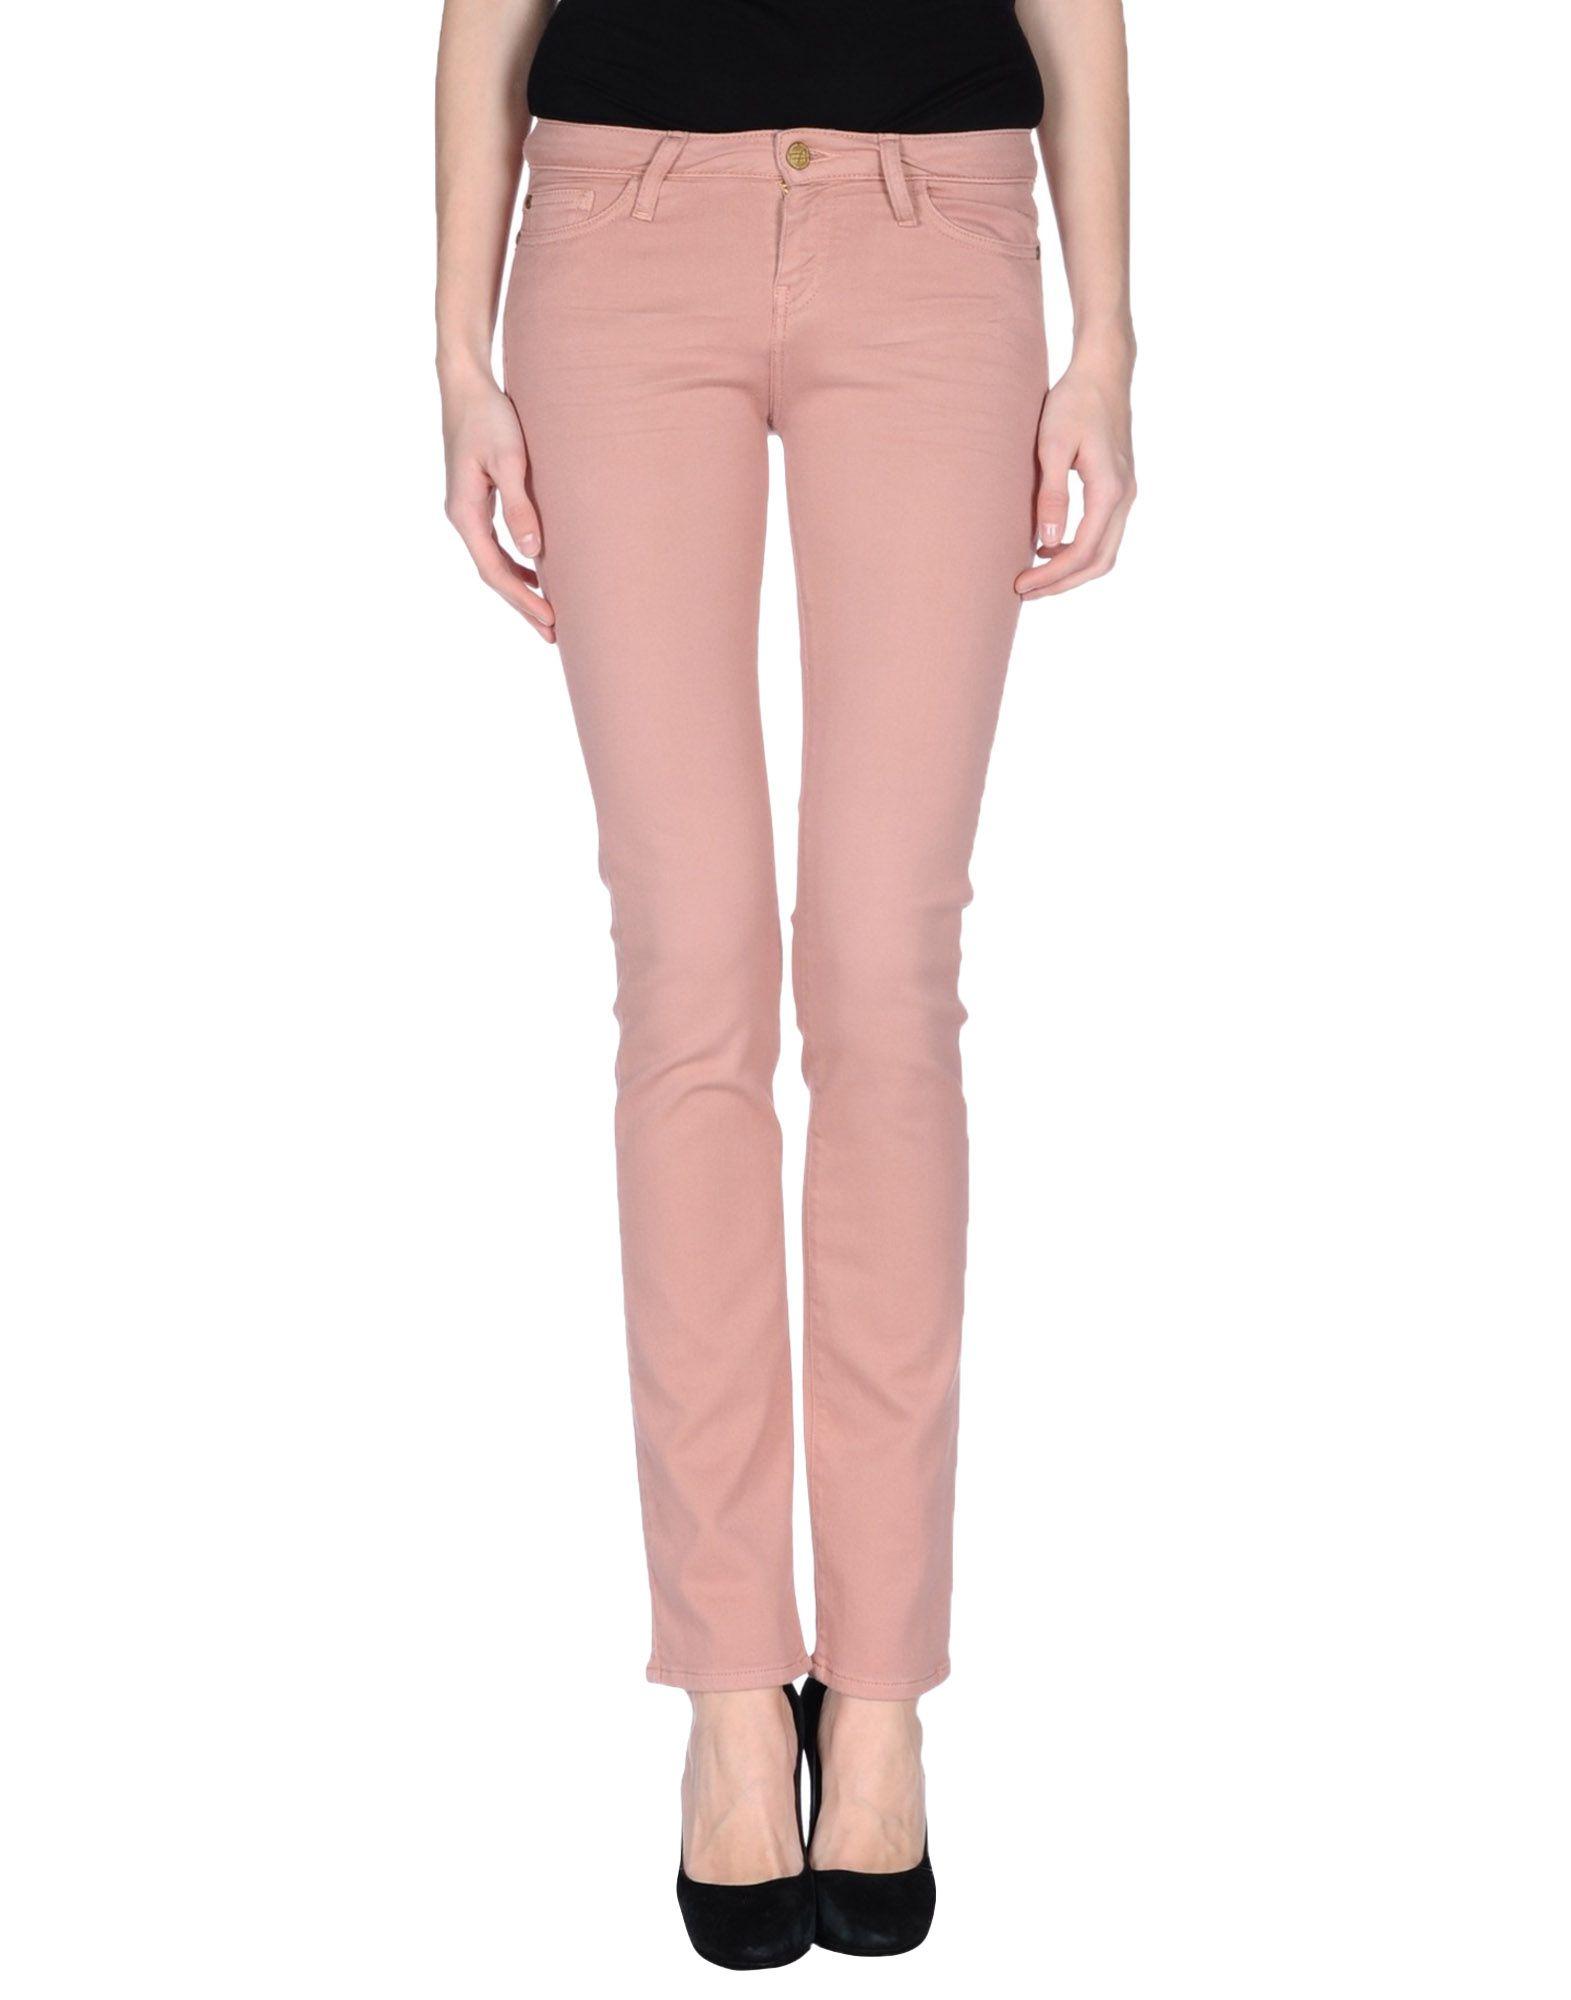 Acquaverde Denim Pants in Pink | Lyst